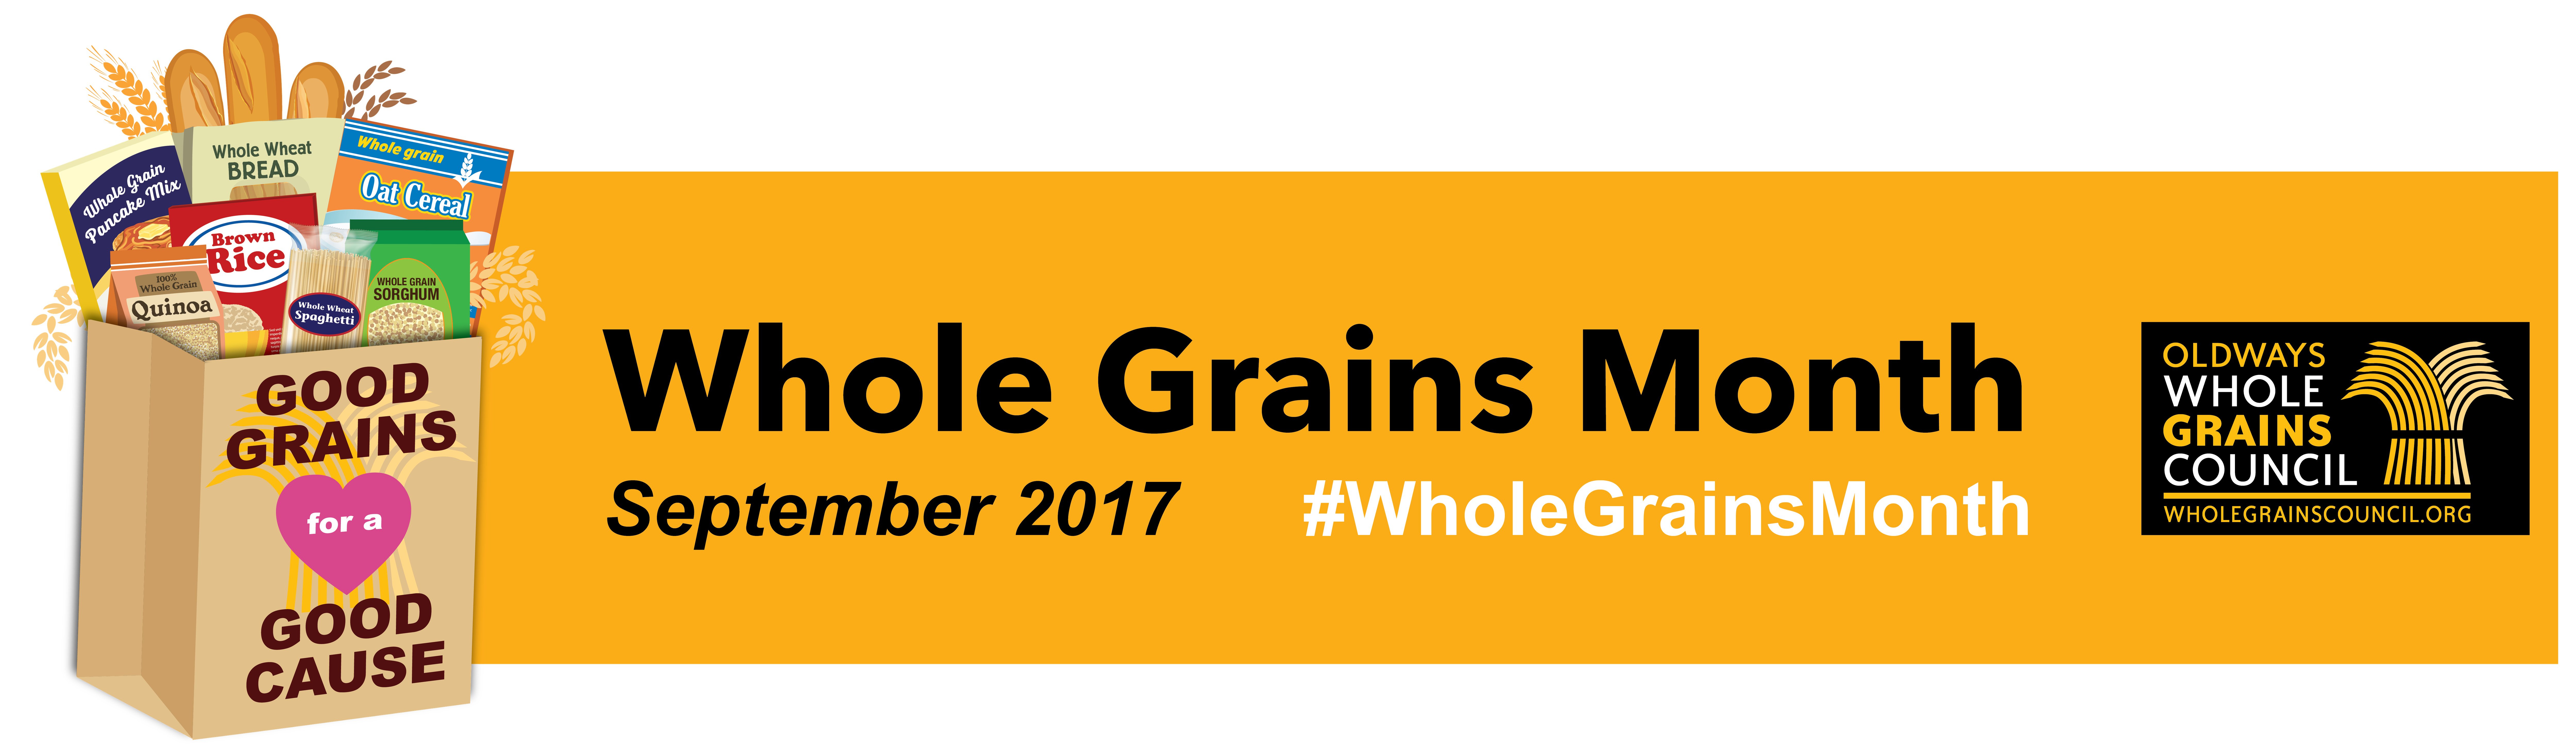 WGMonthLogo2017-banner.png